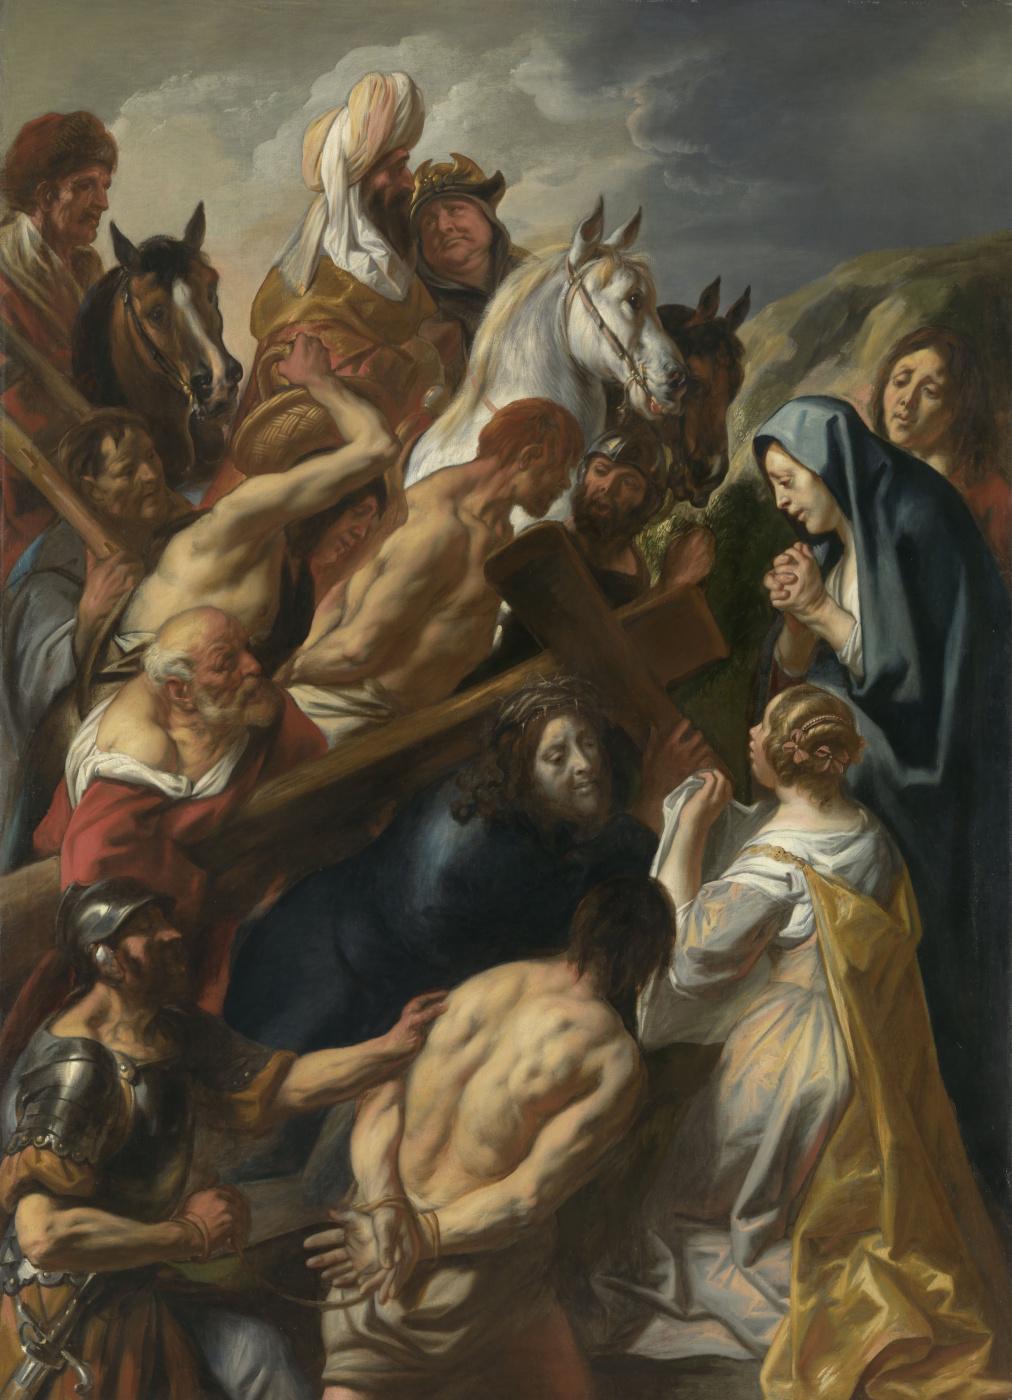 Jacob Jordaens. Carrying the Cross